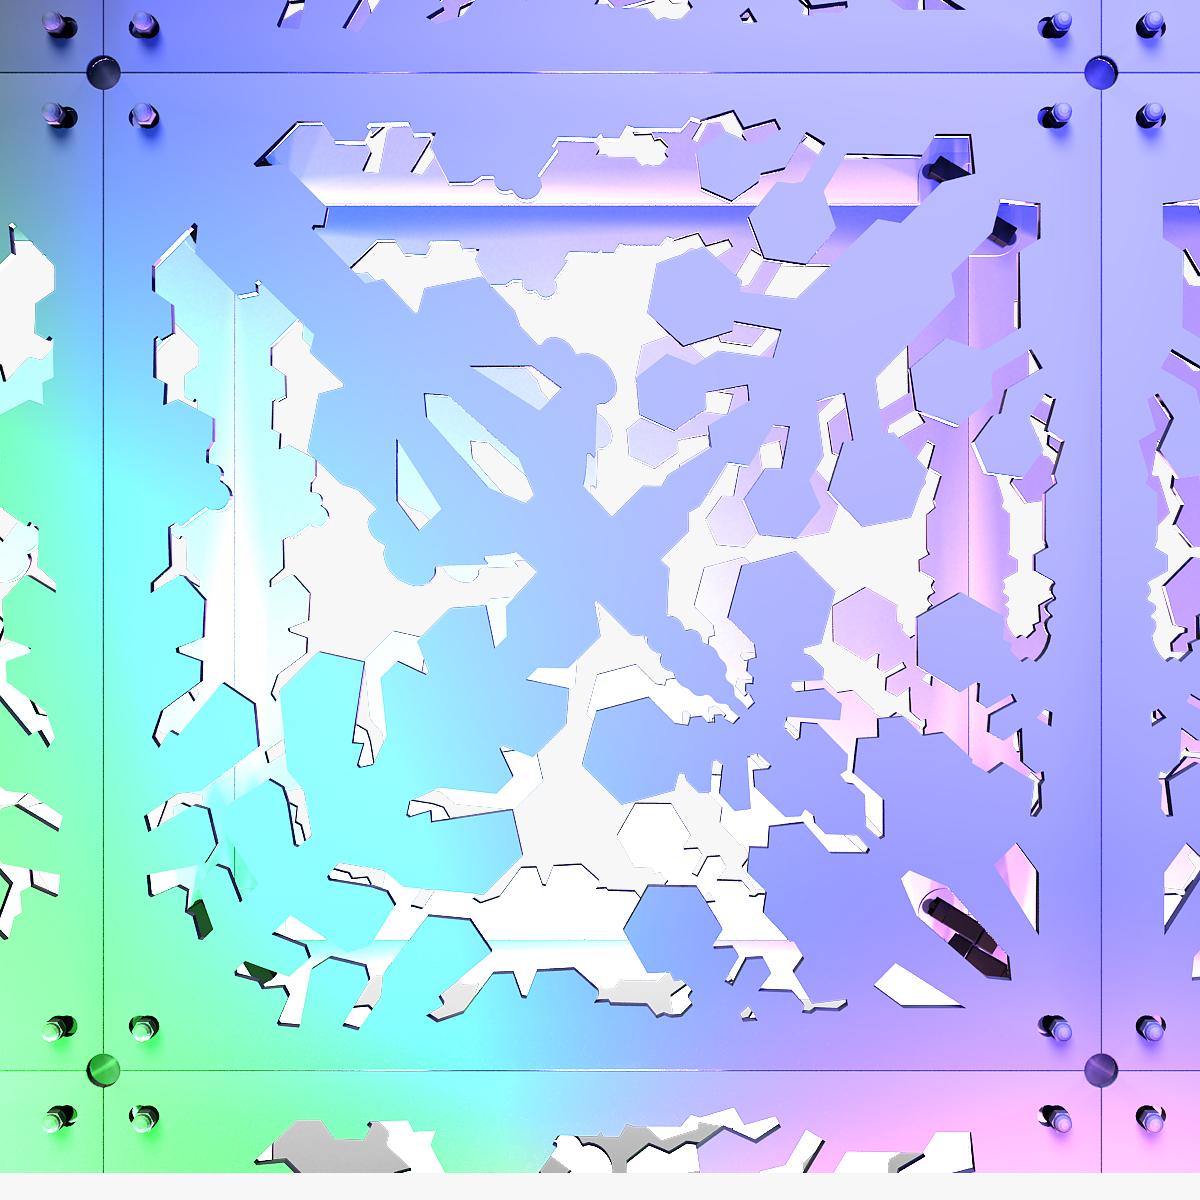 70-06-07-1200x1200.jpg Download STL file Stage Decor Collection 01 (Modular 9 Pieces) • 3D printer model, akerStudio